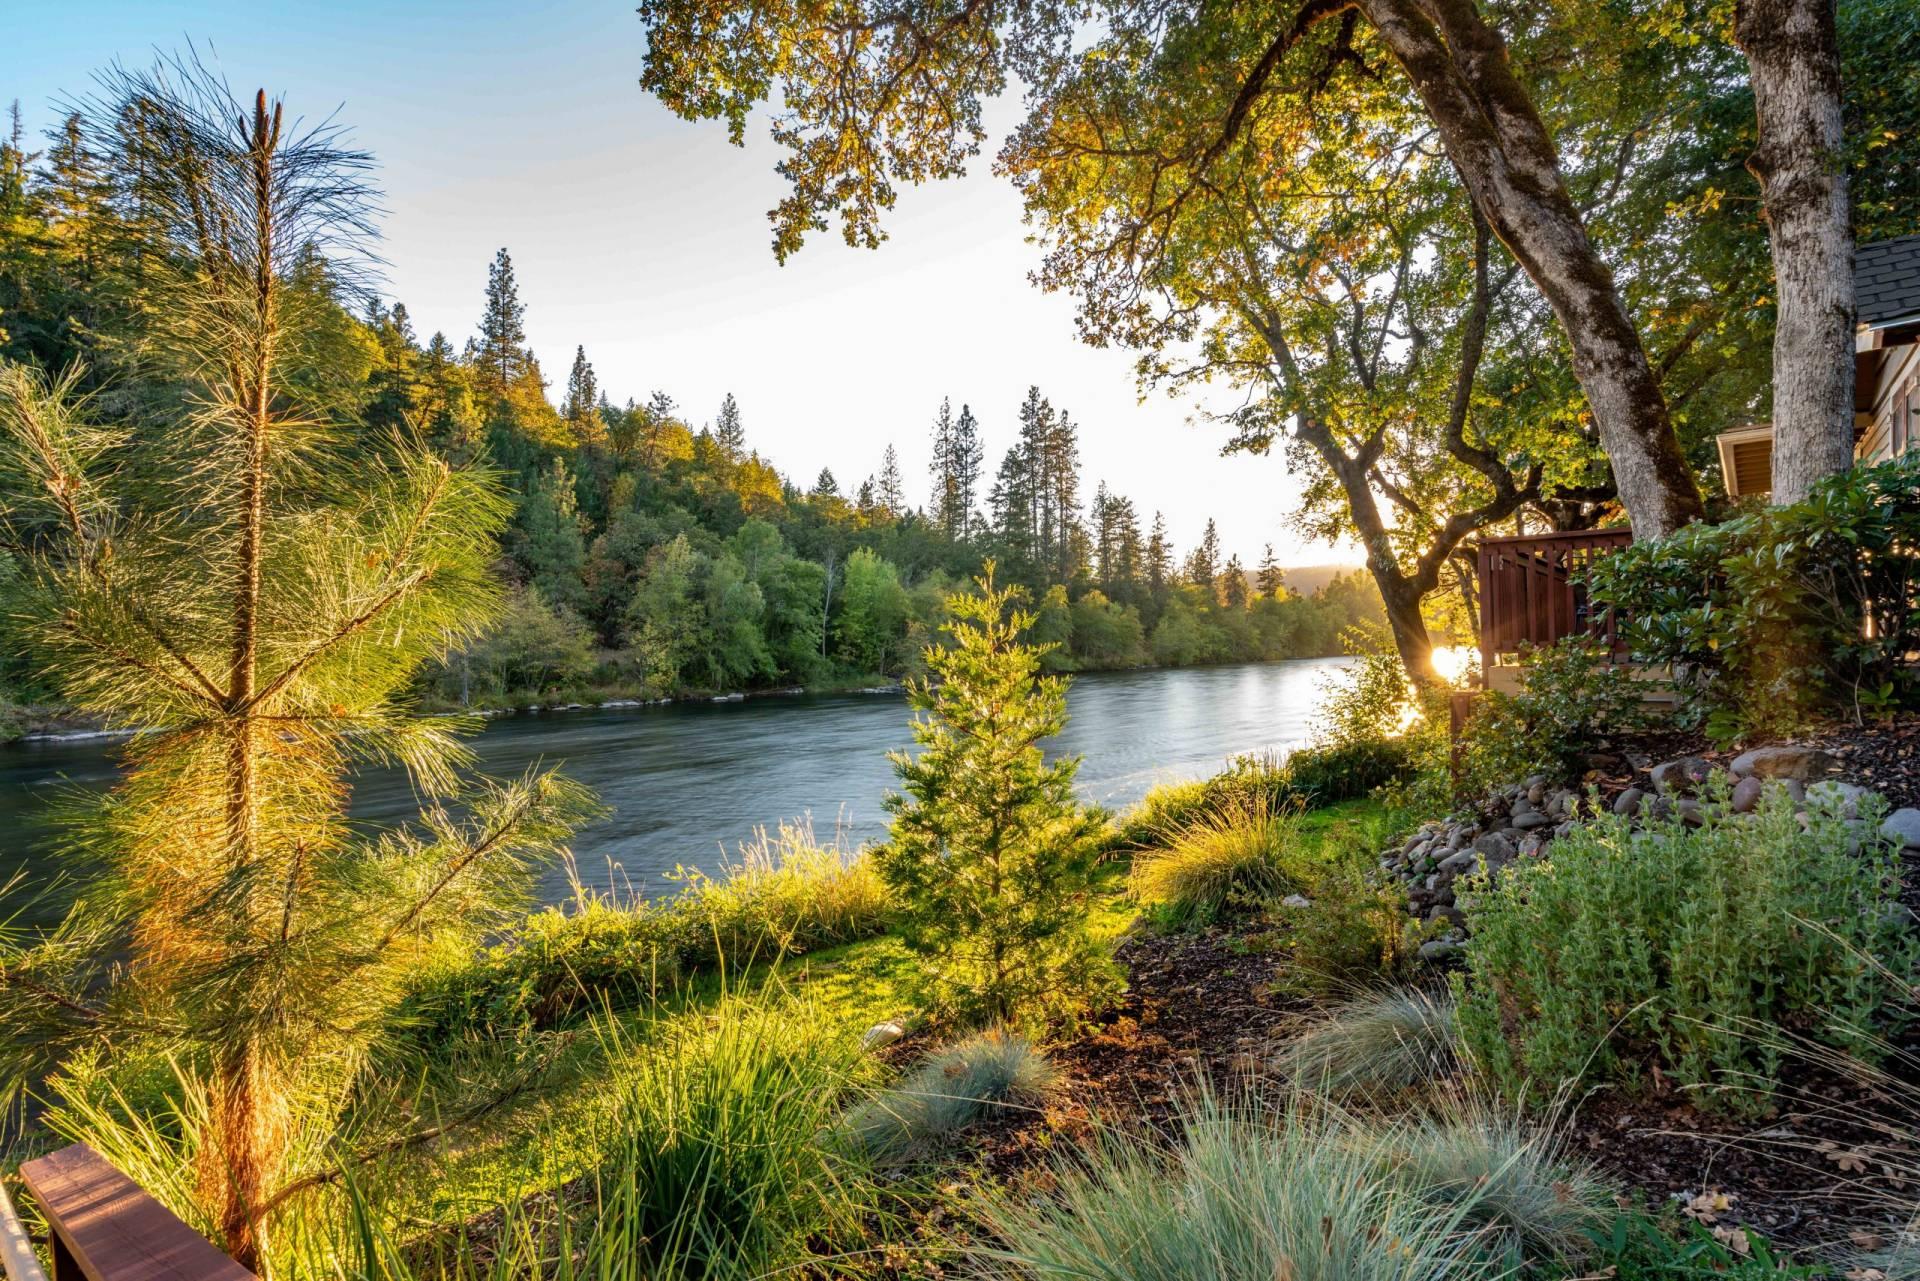 Rogue River Lodge